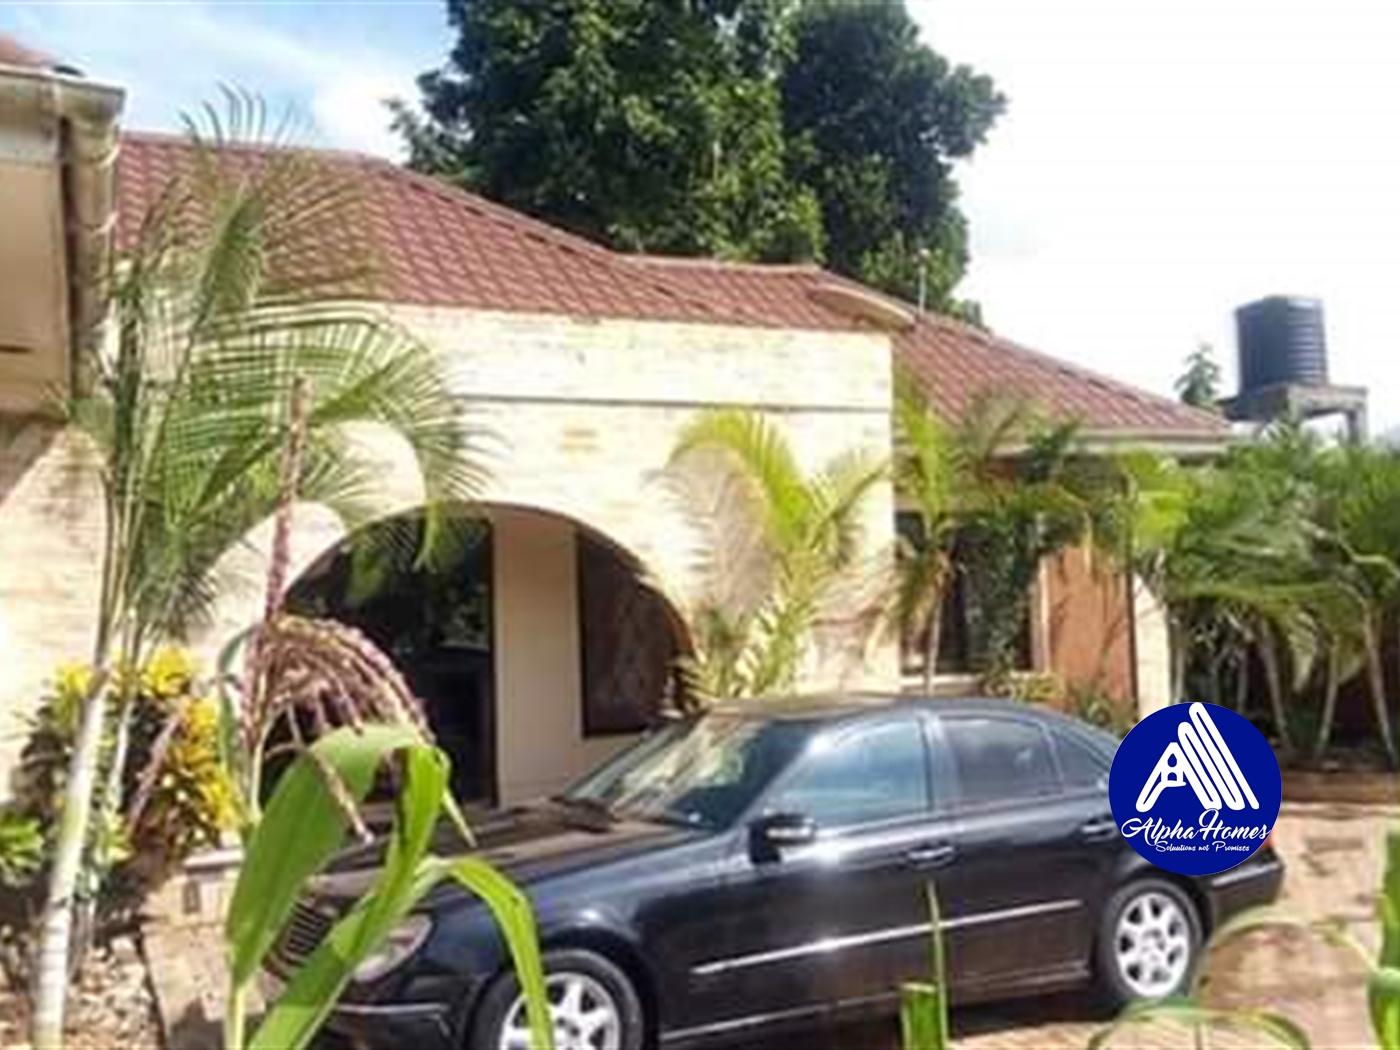 Bungalow for rent in Kitetika Kampala